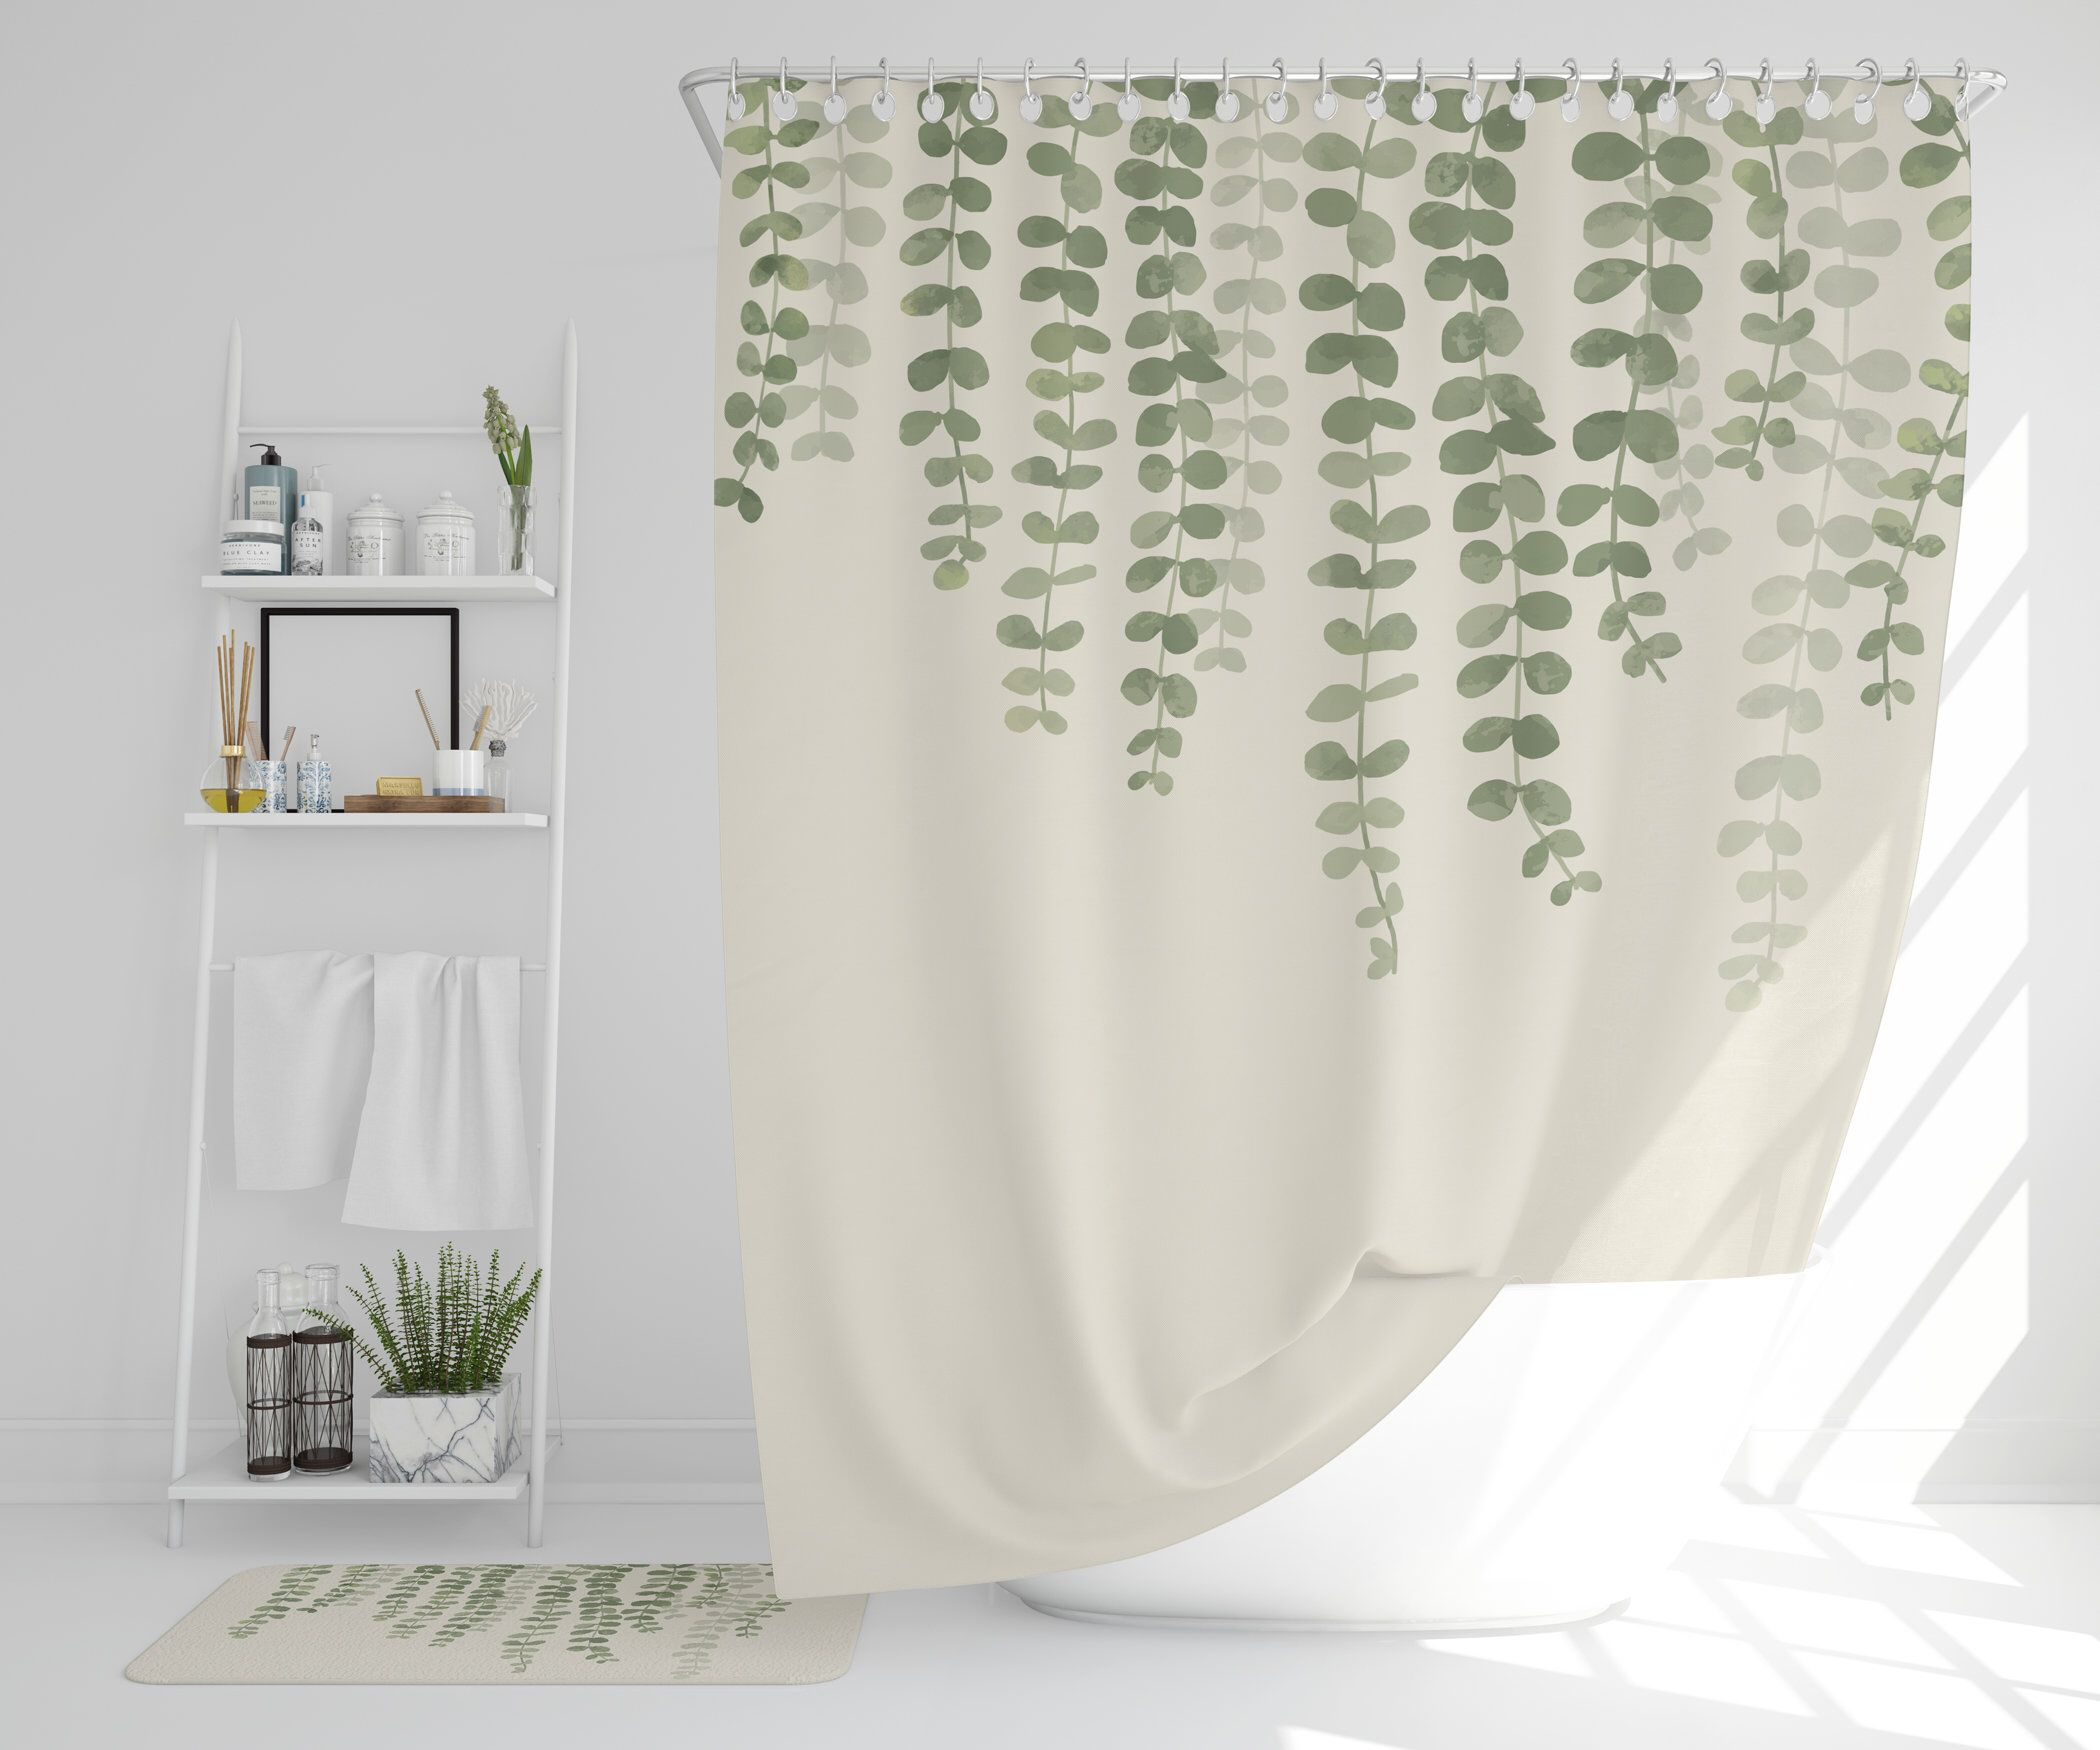 Eucalyptus Hanging Vine Curtain Green Vines Shower Curtain Etsy